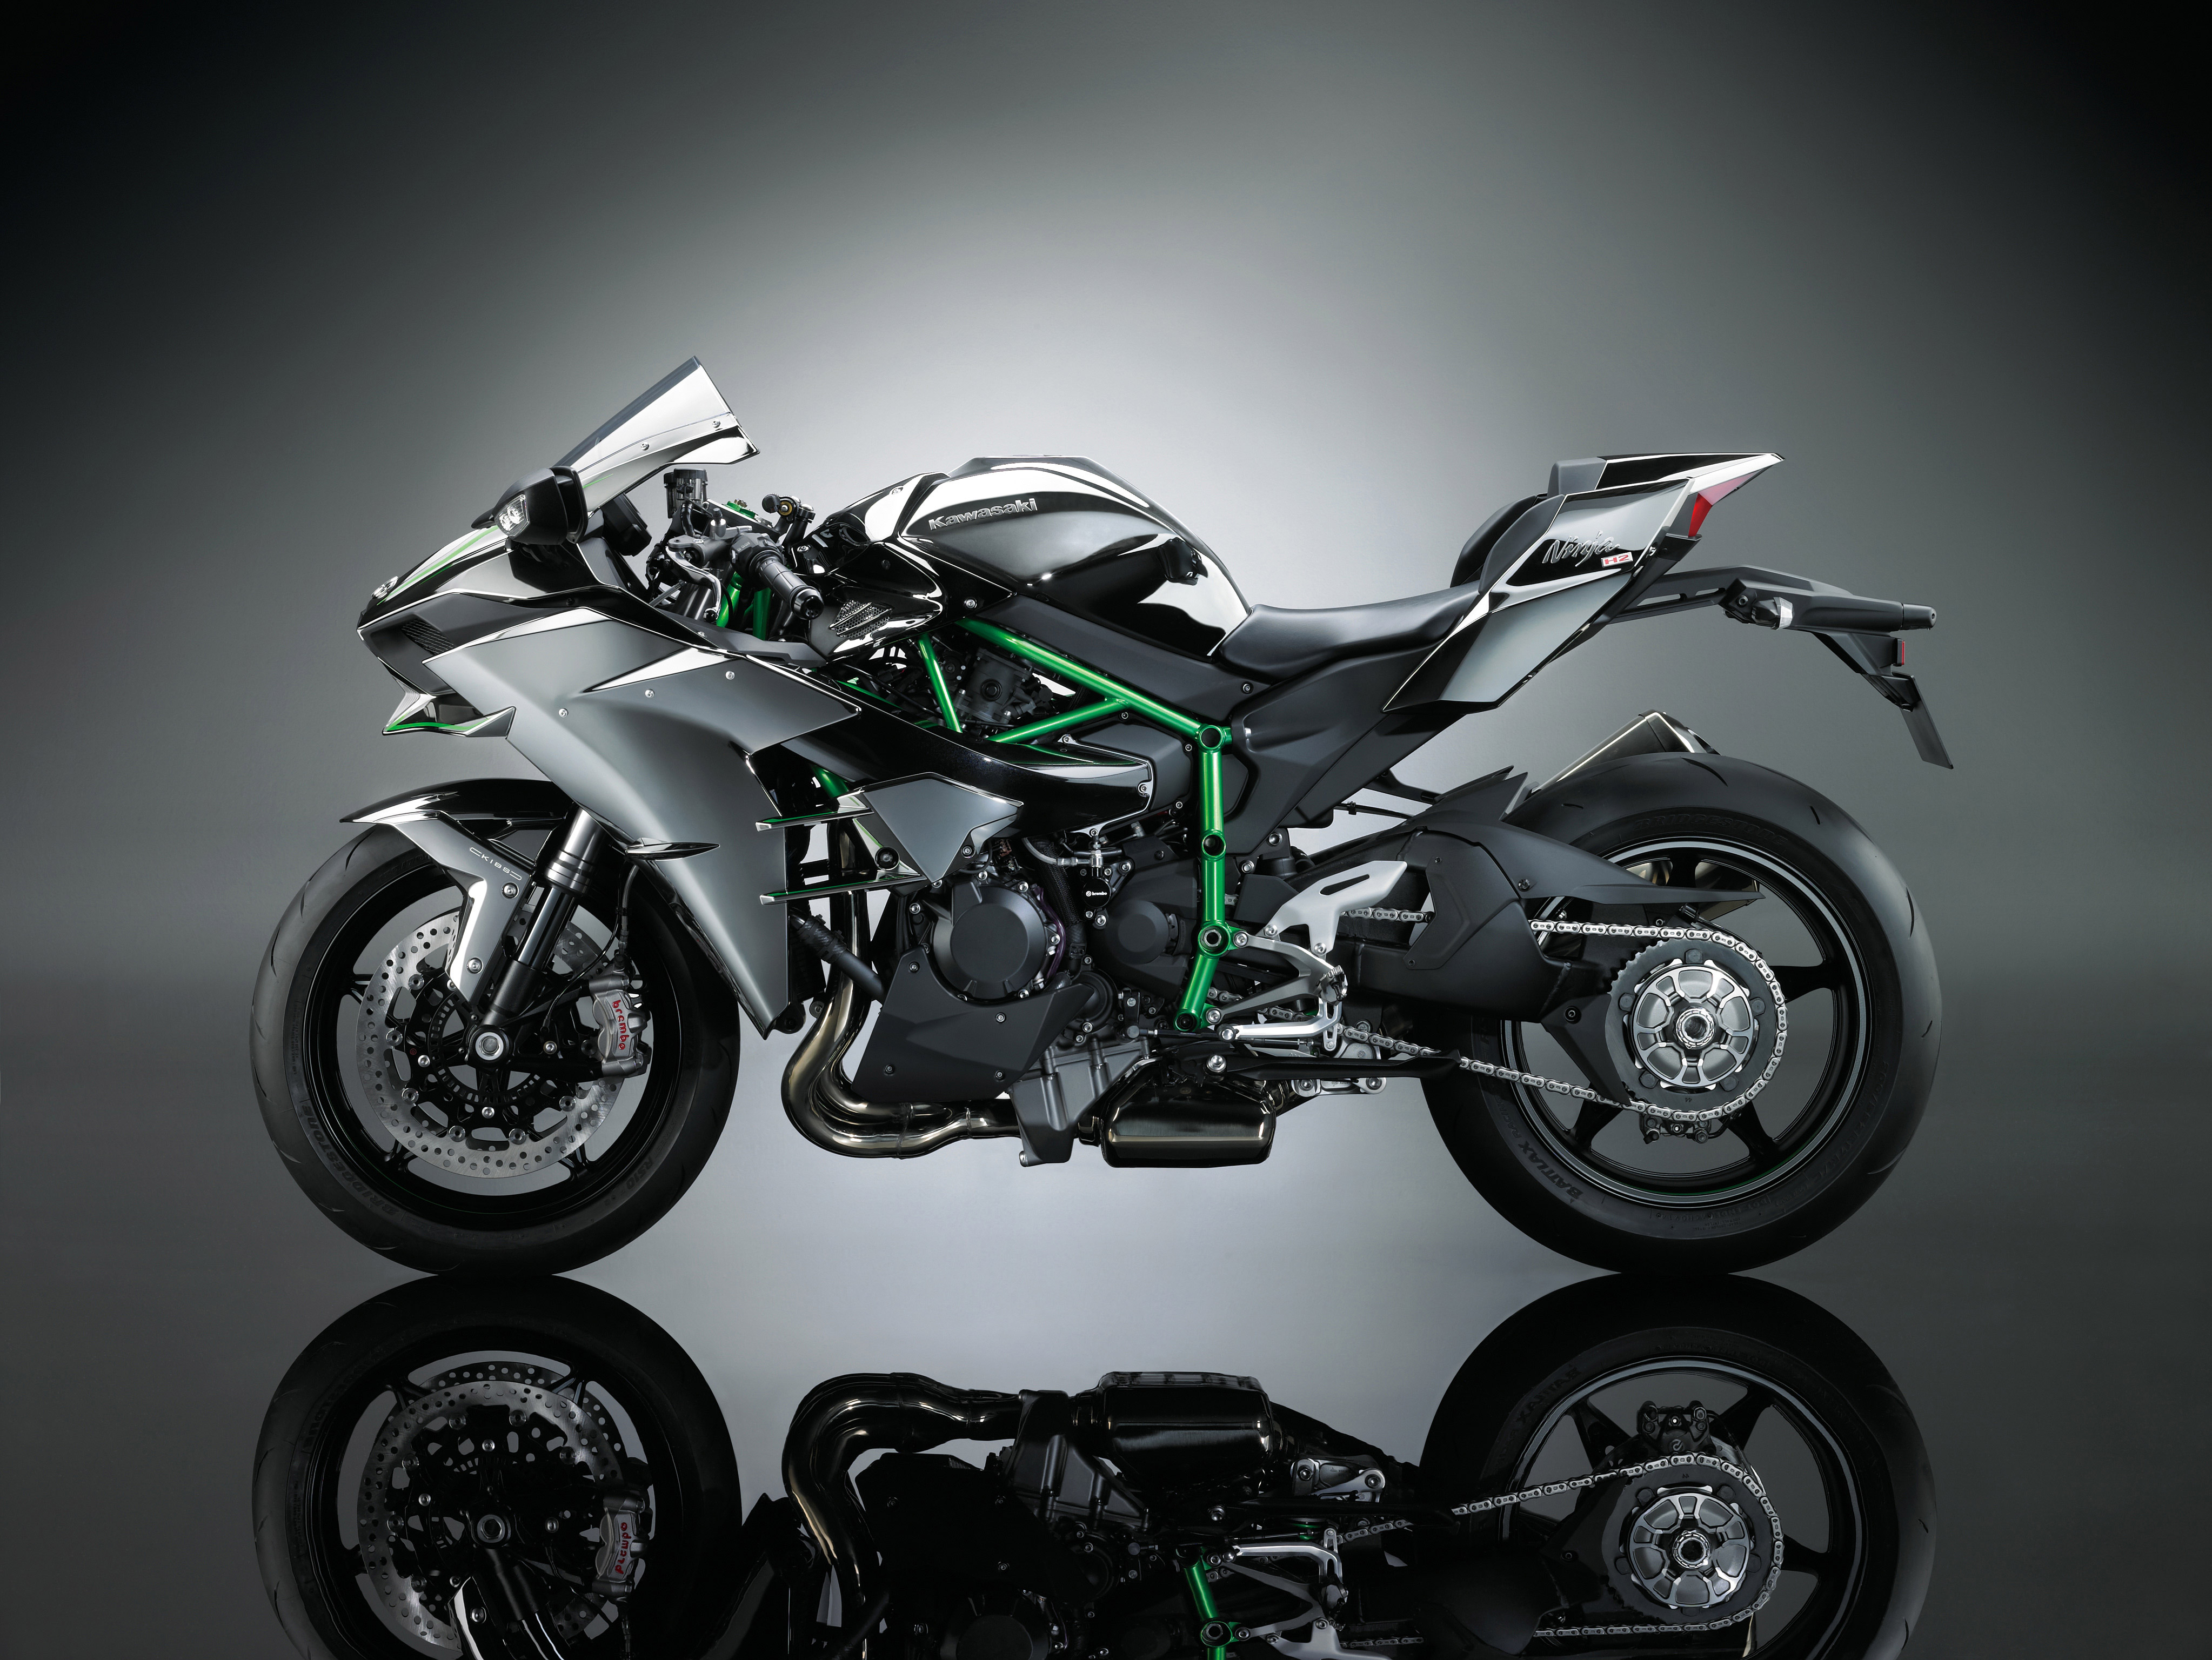 Kawasaki Ninja H2 4k, HD Bikes, 4k Wallpapers, Images